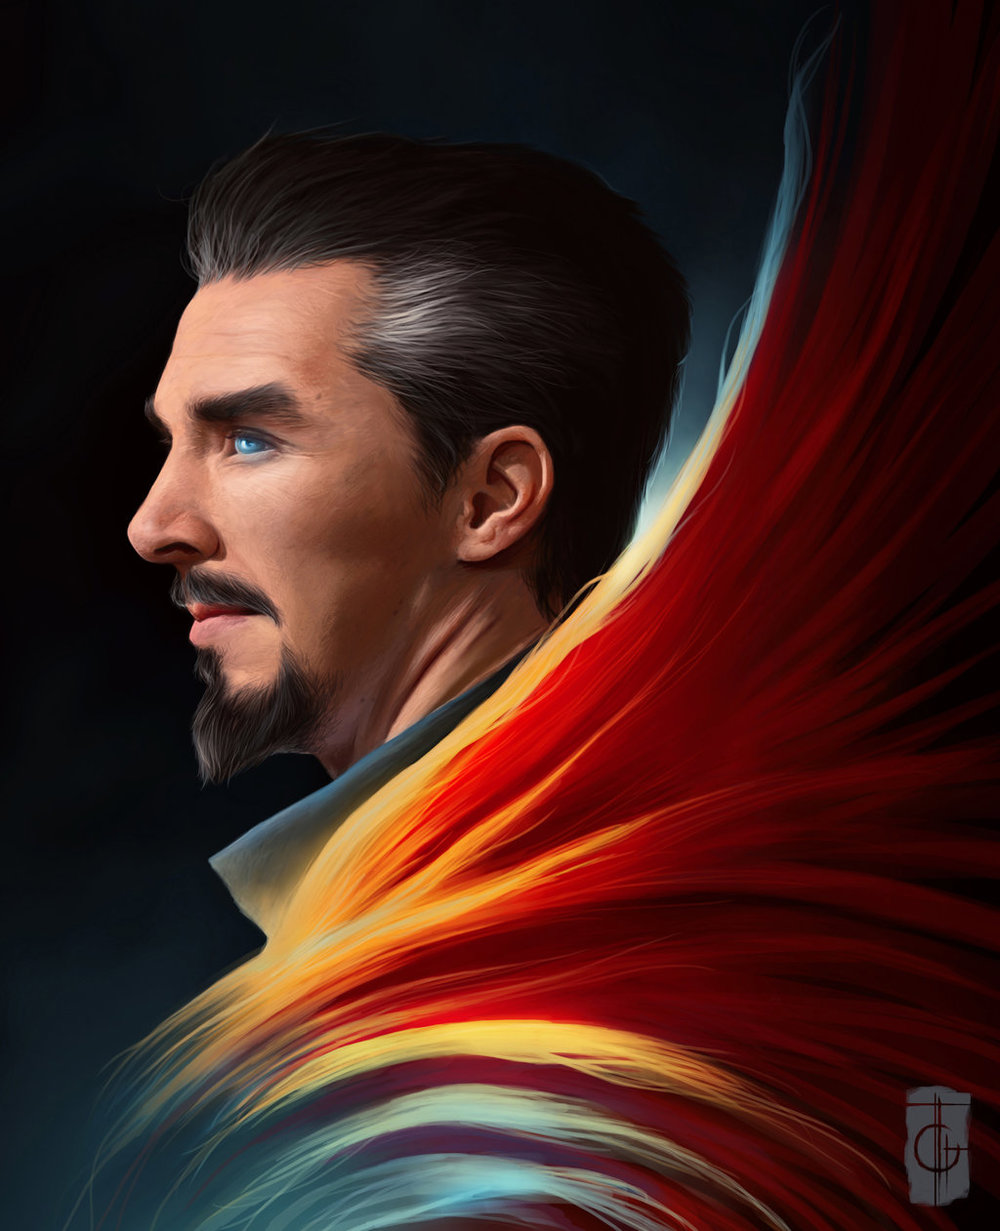 doctor_strange_by_thegameworld-d8basdo.jpg